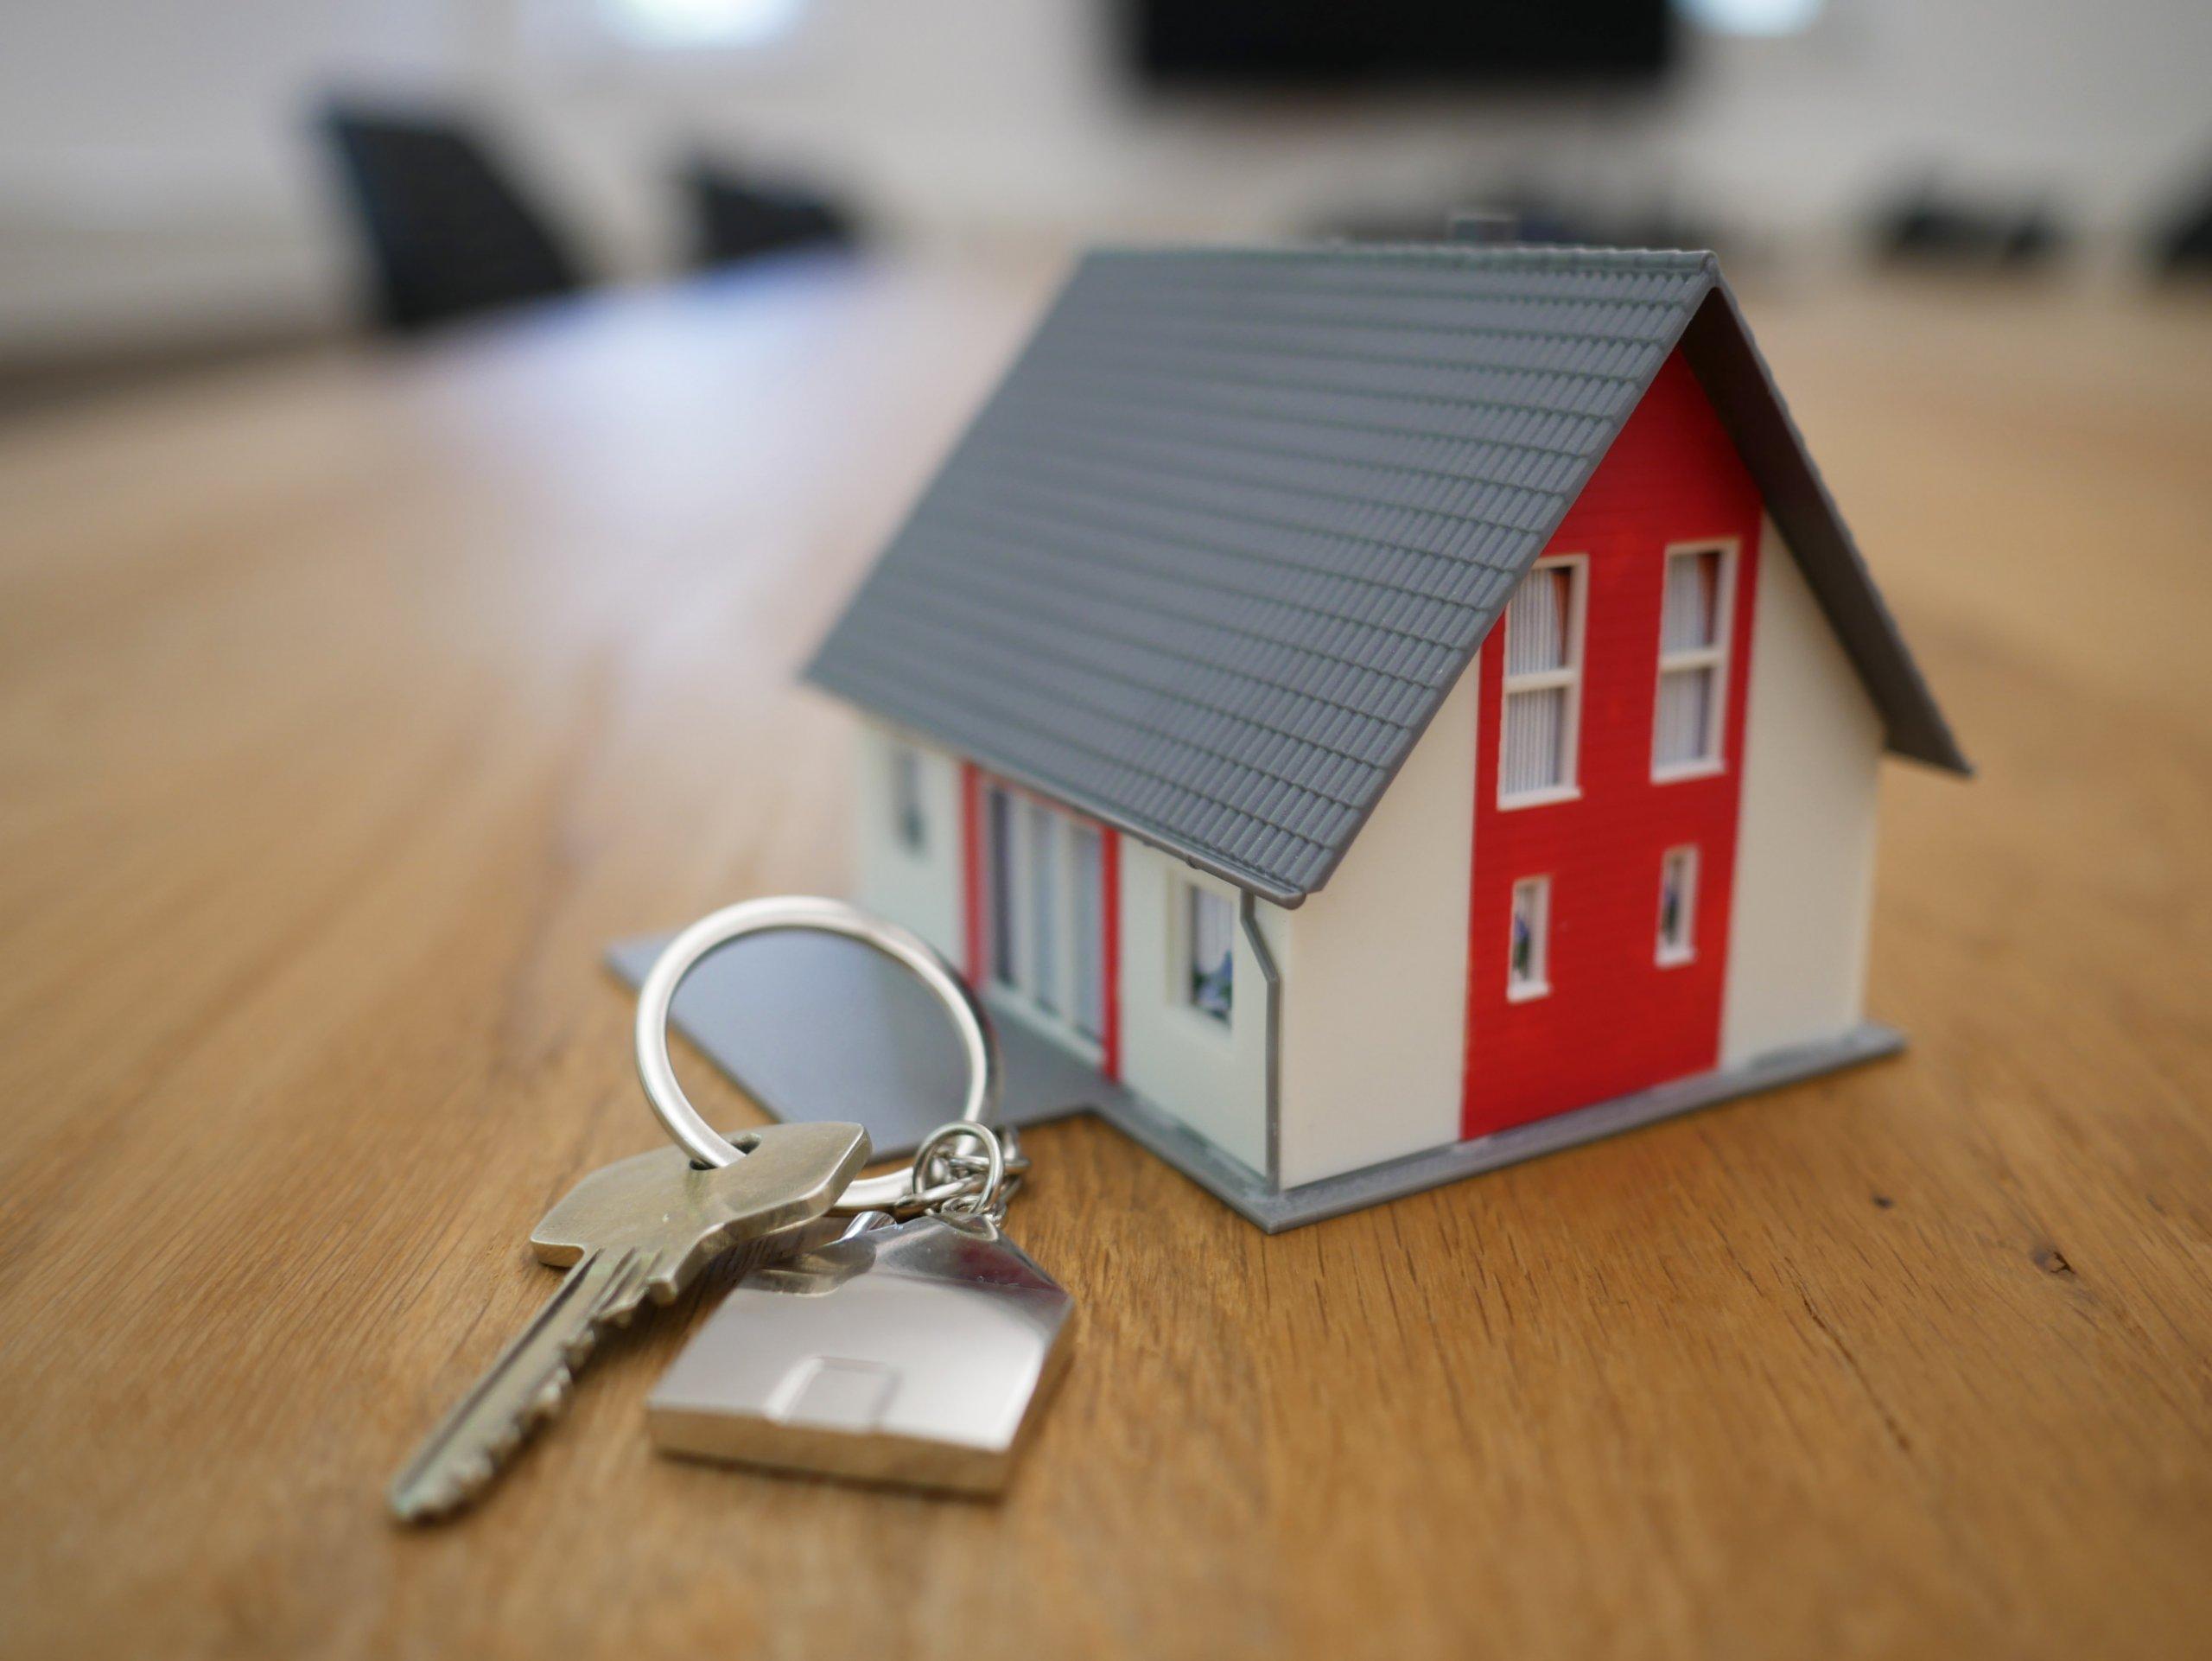 Odobreno rekordnih 4.648 zahtjeva za subvencioniranje stambenih kredita: Prosječan iznos 75.000 eura